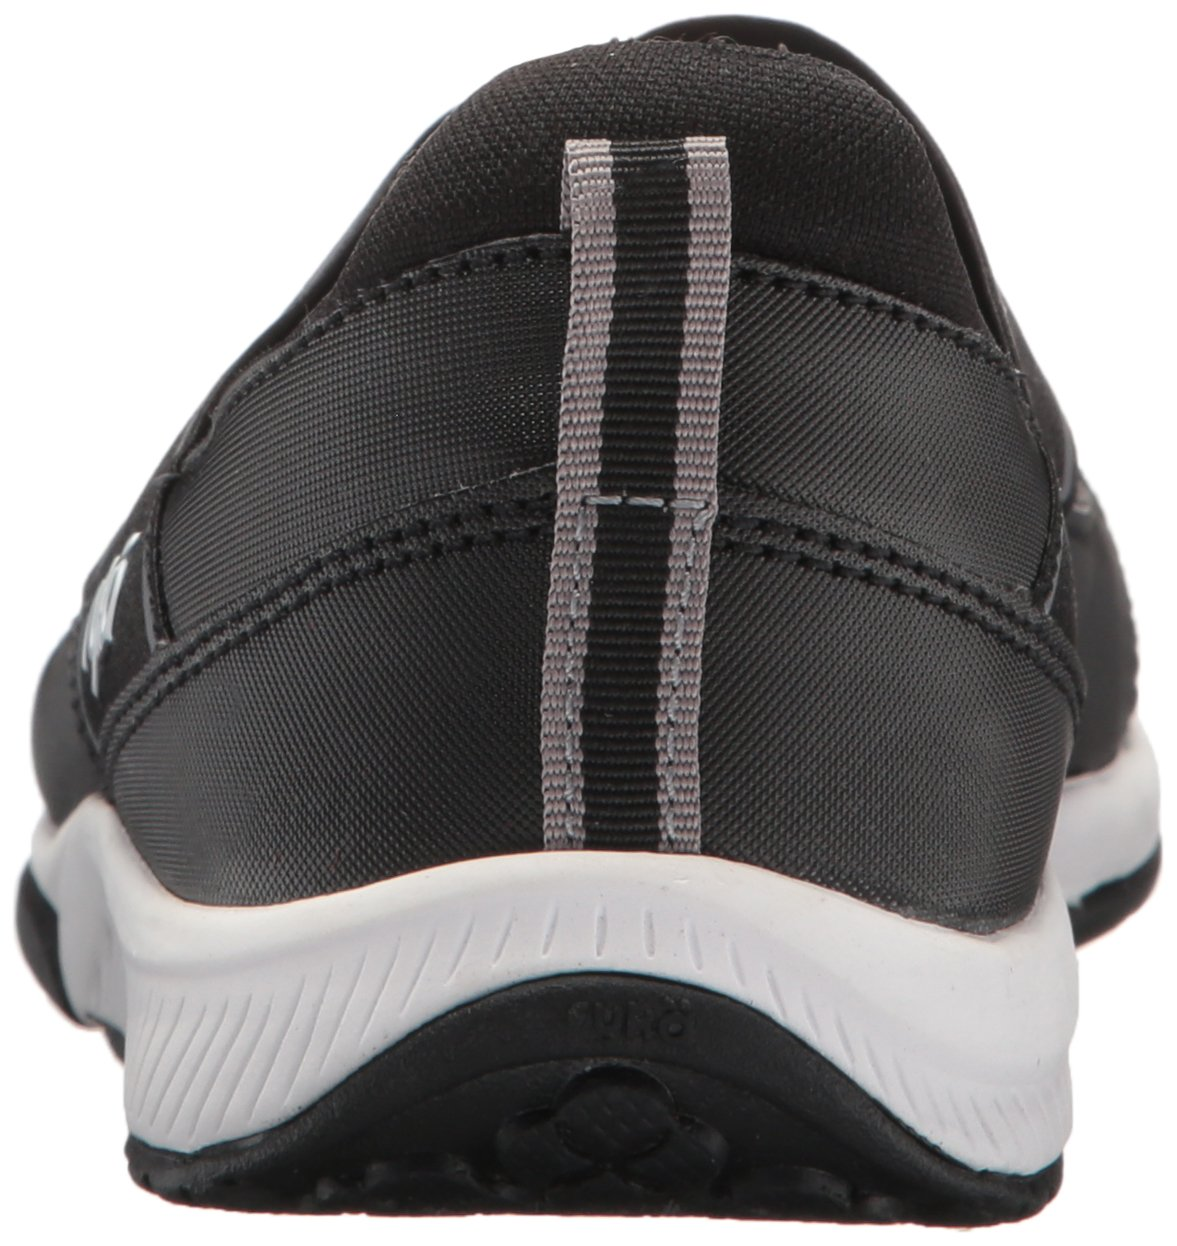 Ryka Women's klick Sneaker B07577XK64 9 B(M) US|Black/White